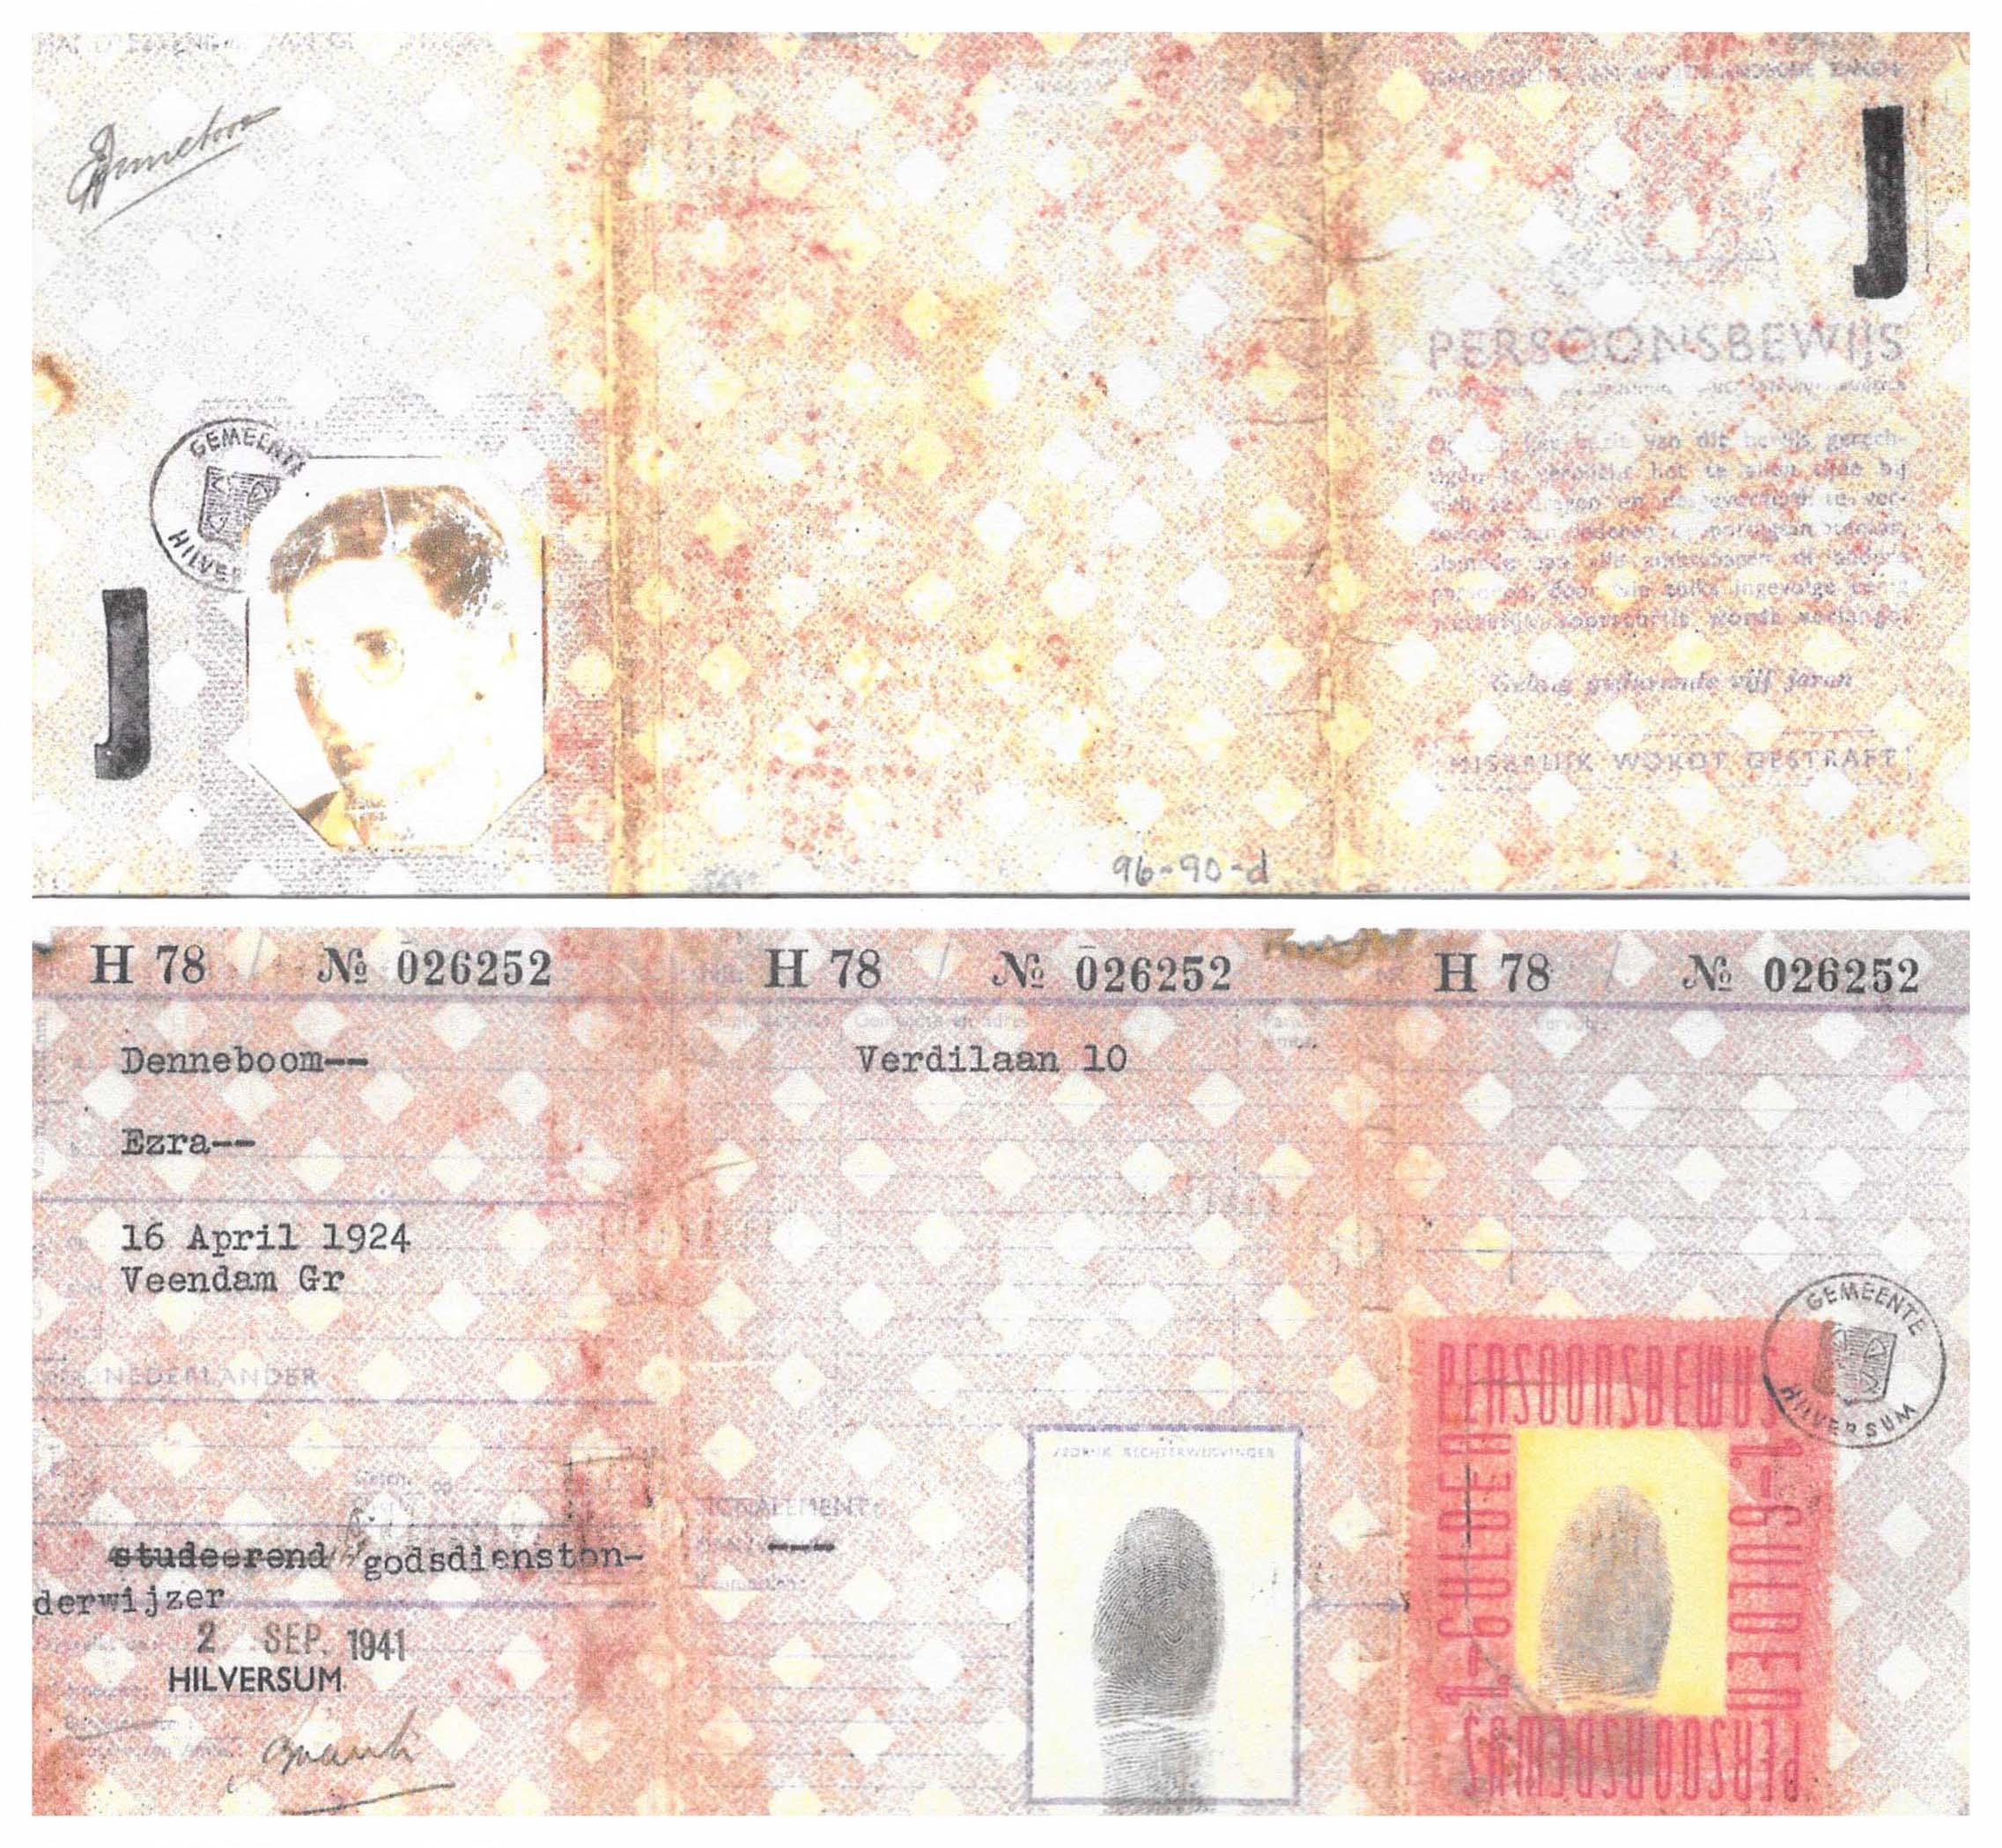 Ezra's Identification card stamped 'J'